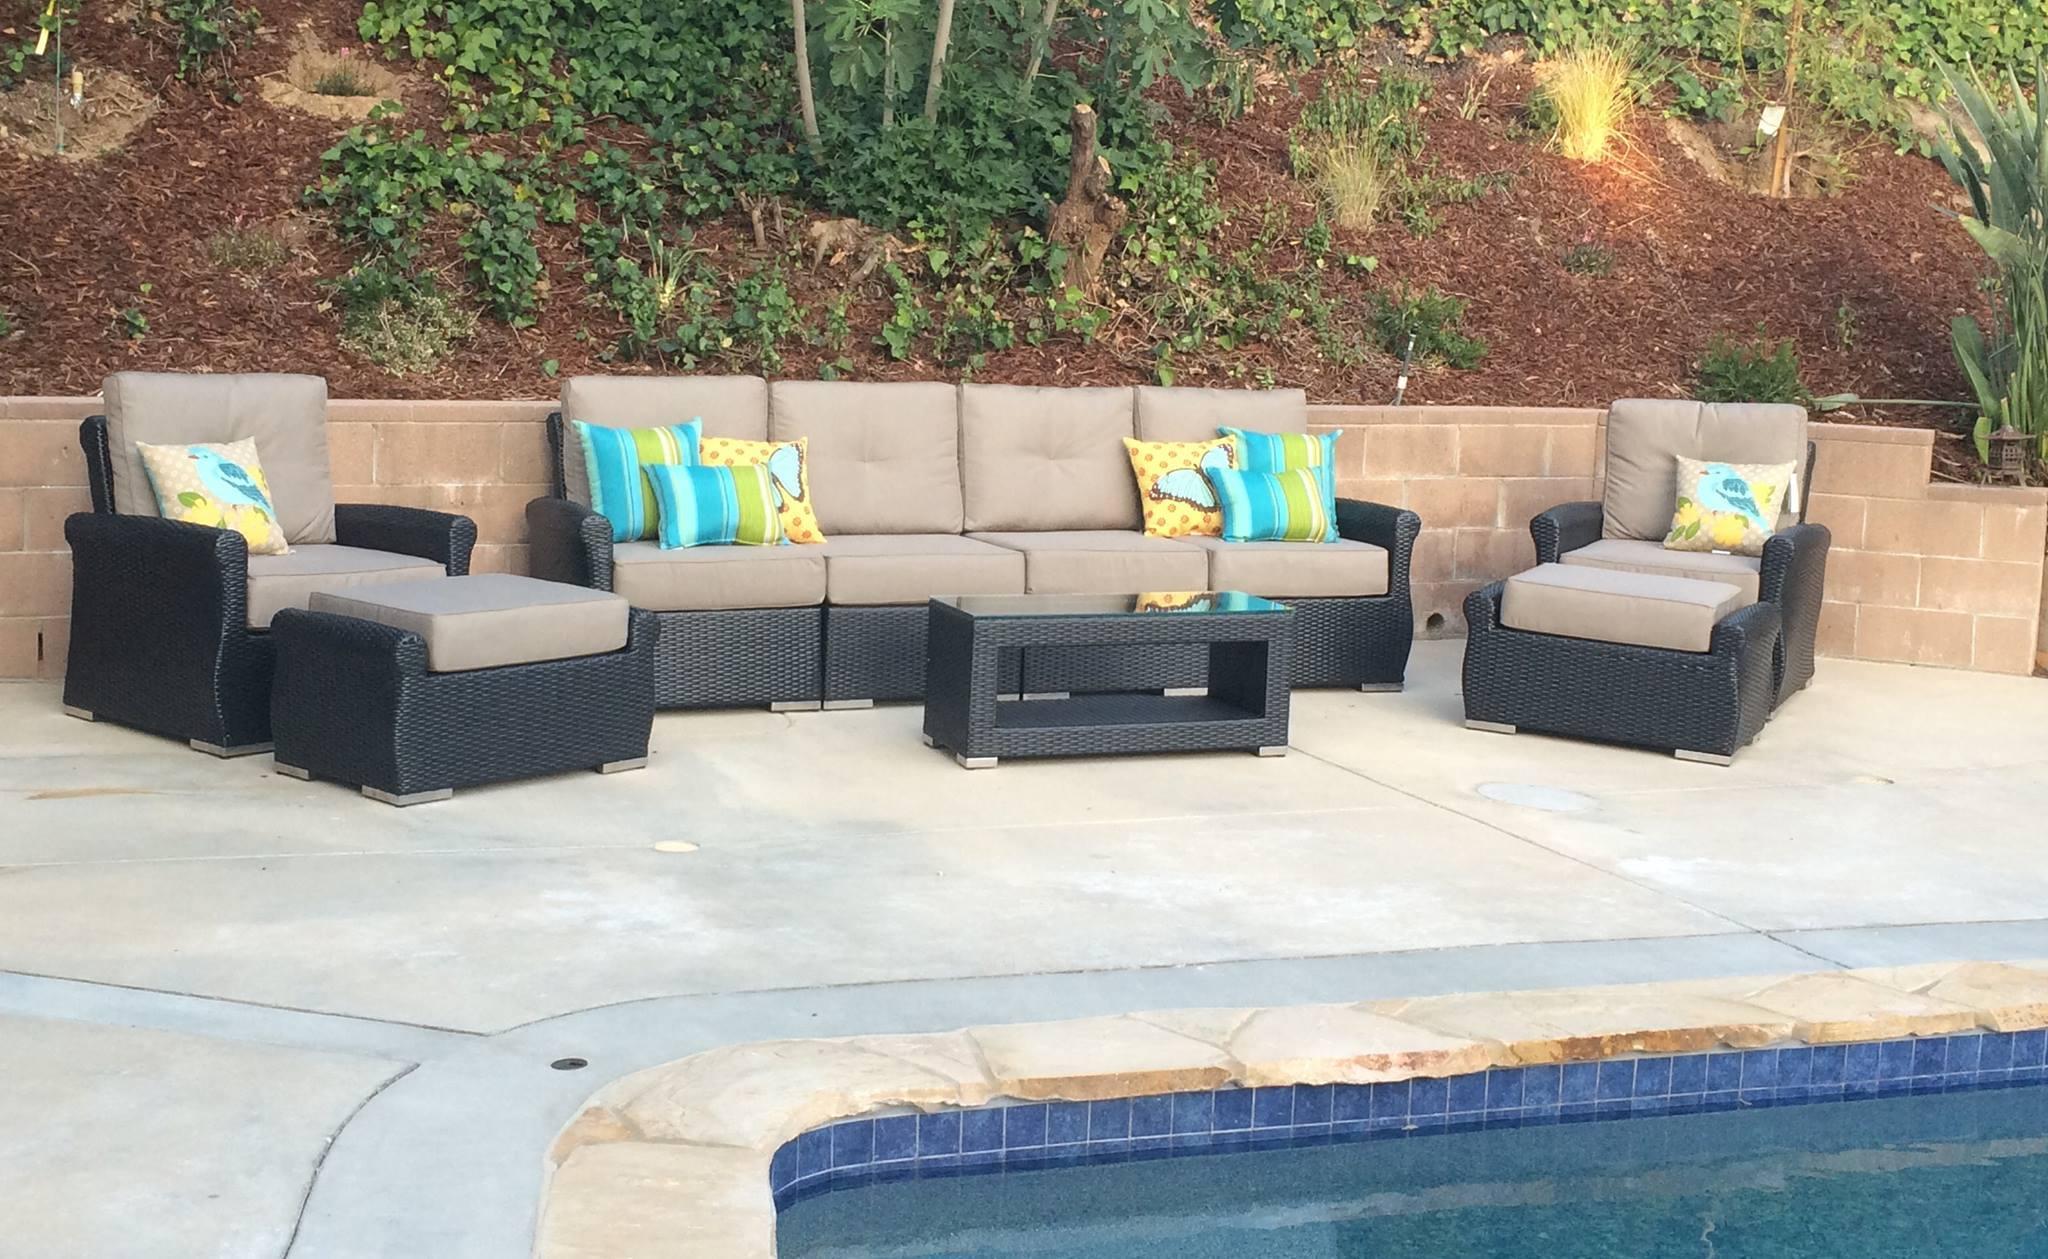 ohana-luxury-collection-patio-seating-set